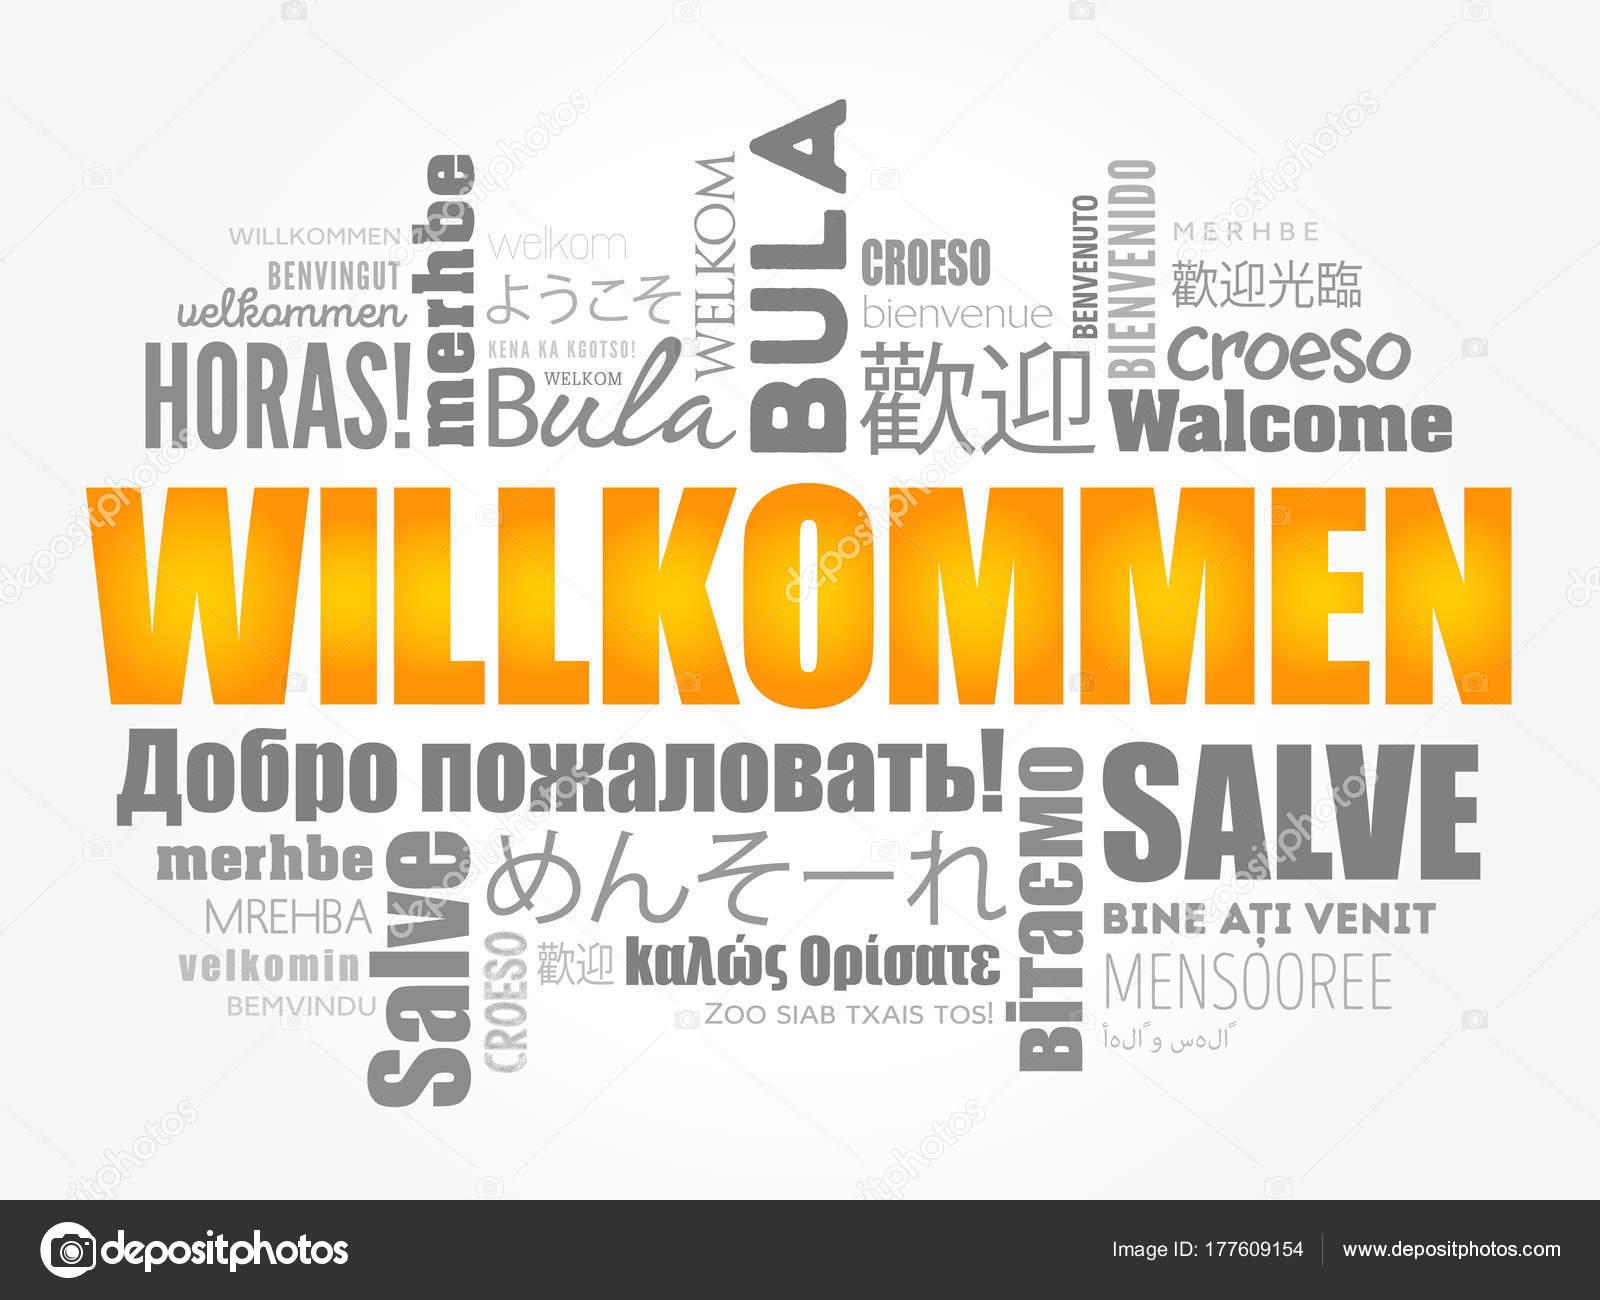 Frases Para Collage De Familia Willkommen Welcome En